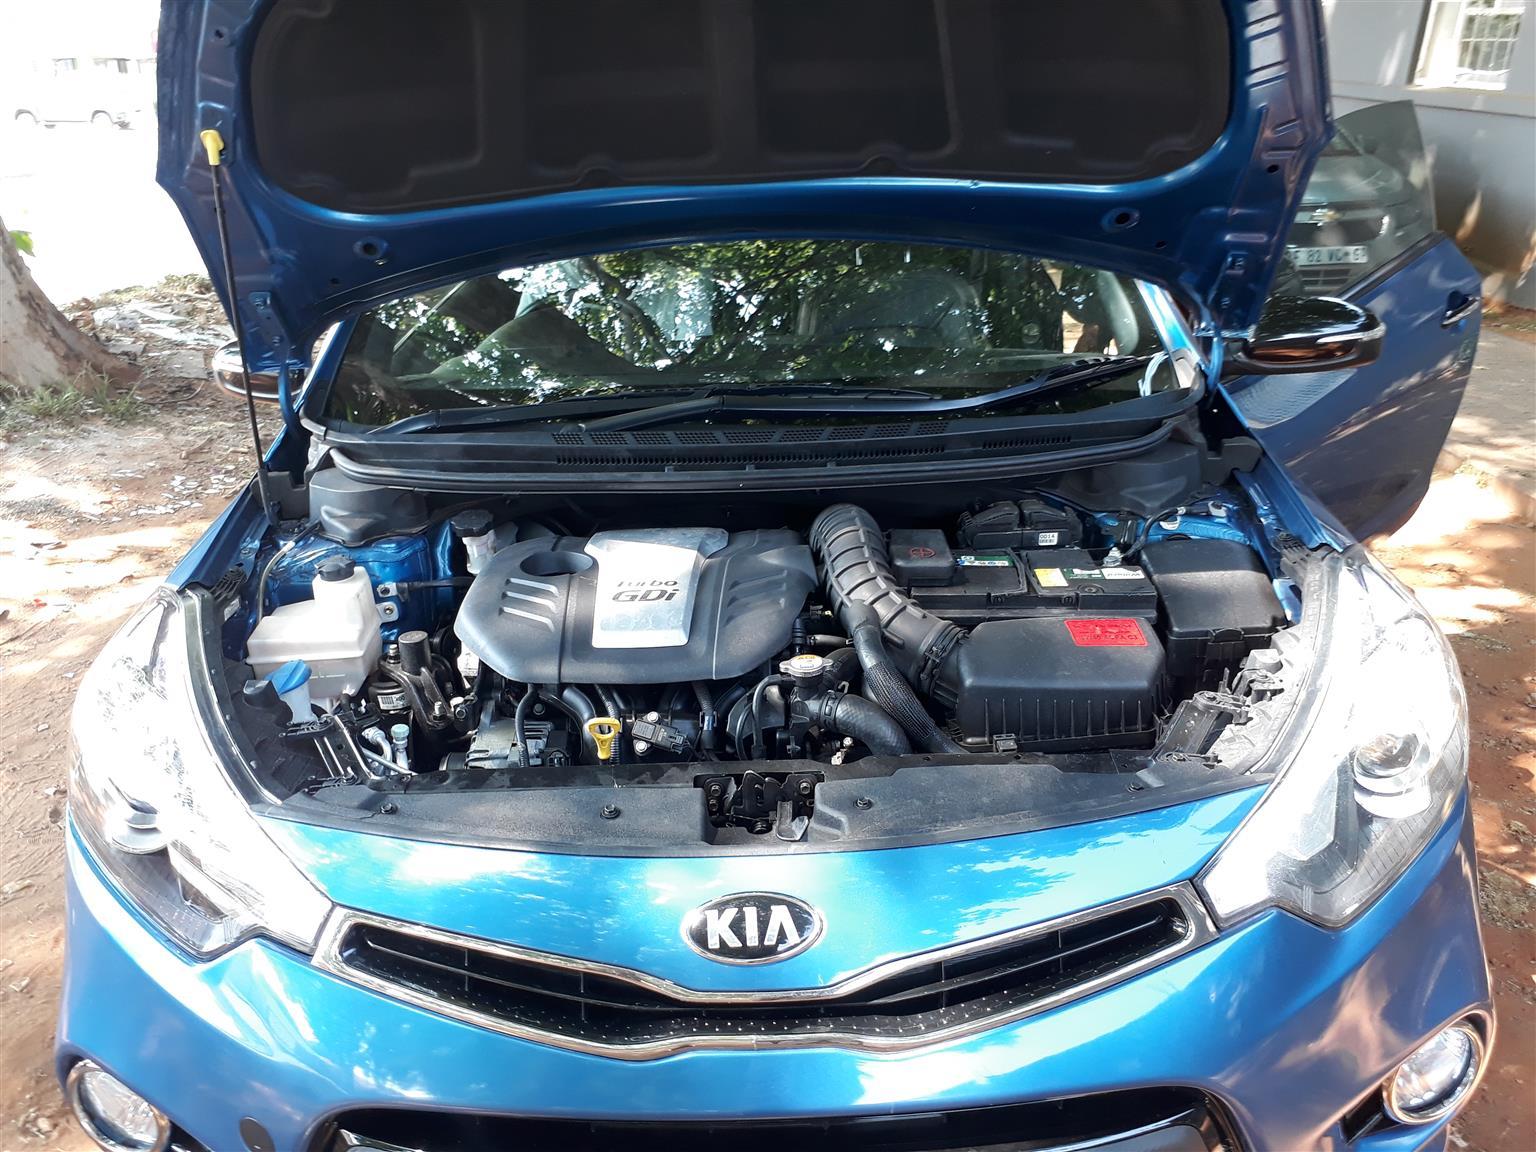 2015 Kia Cerato Koup 2.0 SX automatic